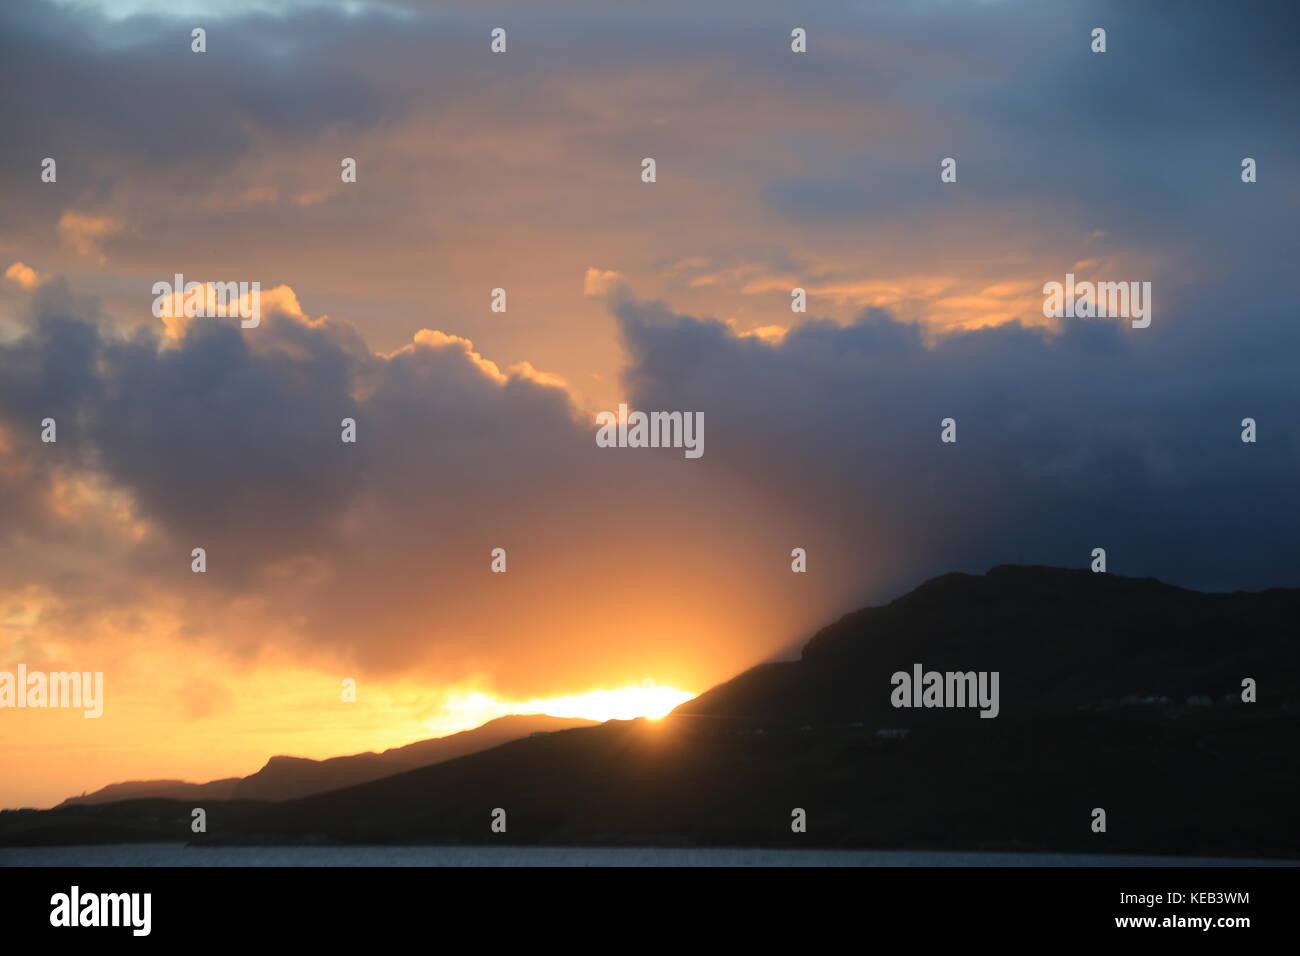 Sky view in Ireland - Stock Image